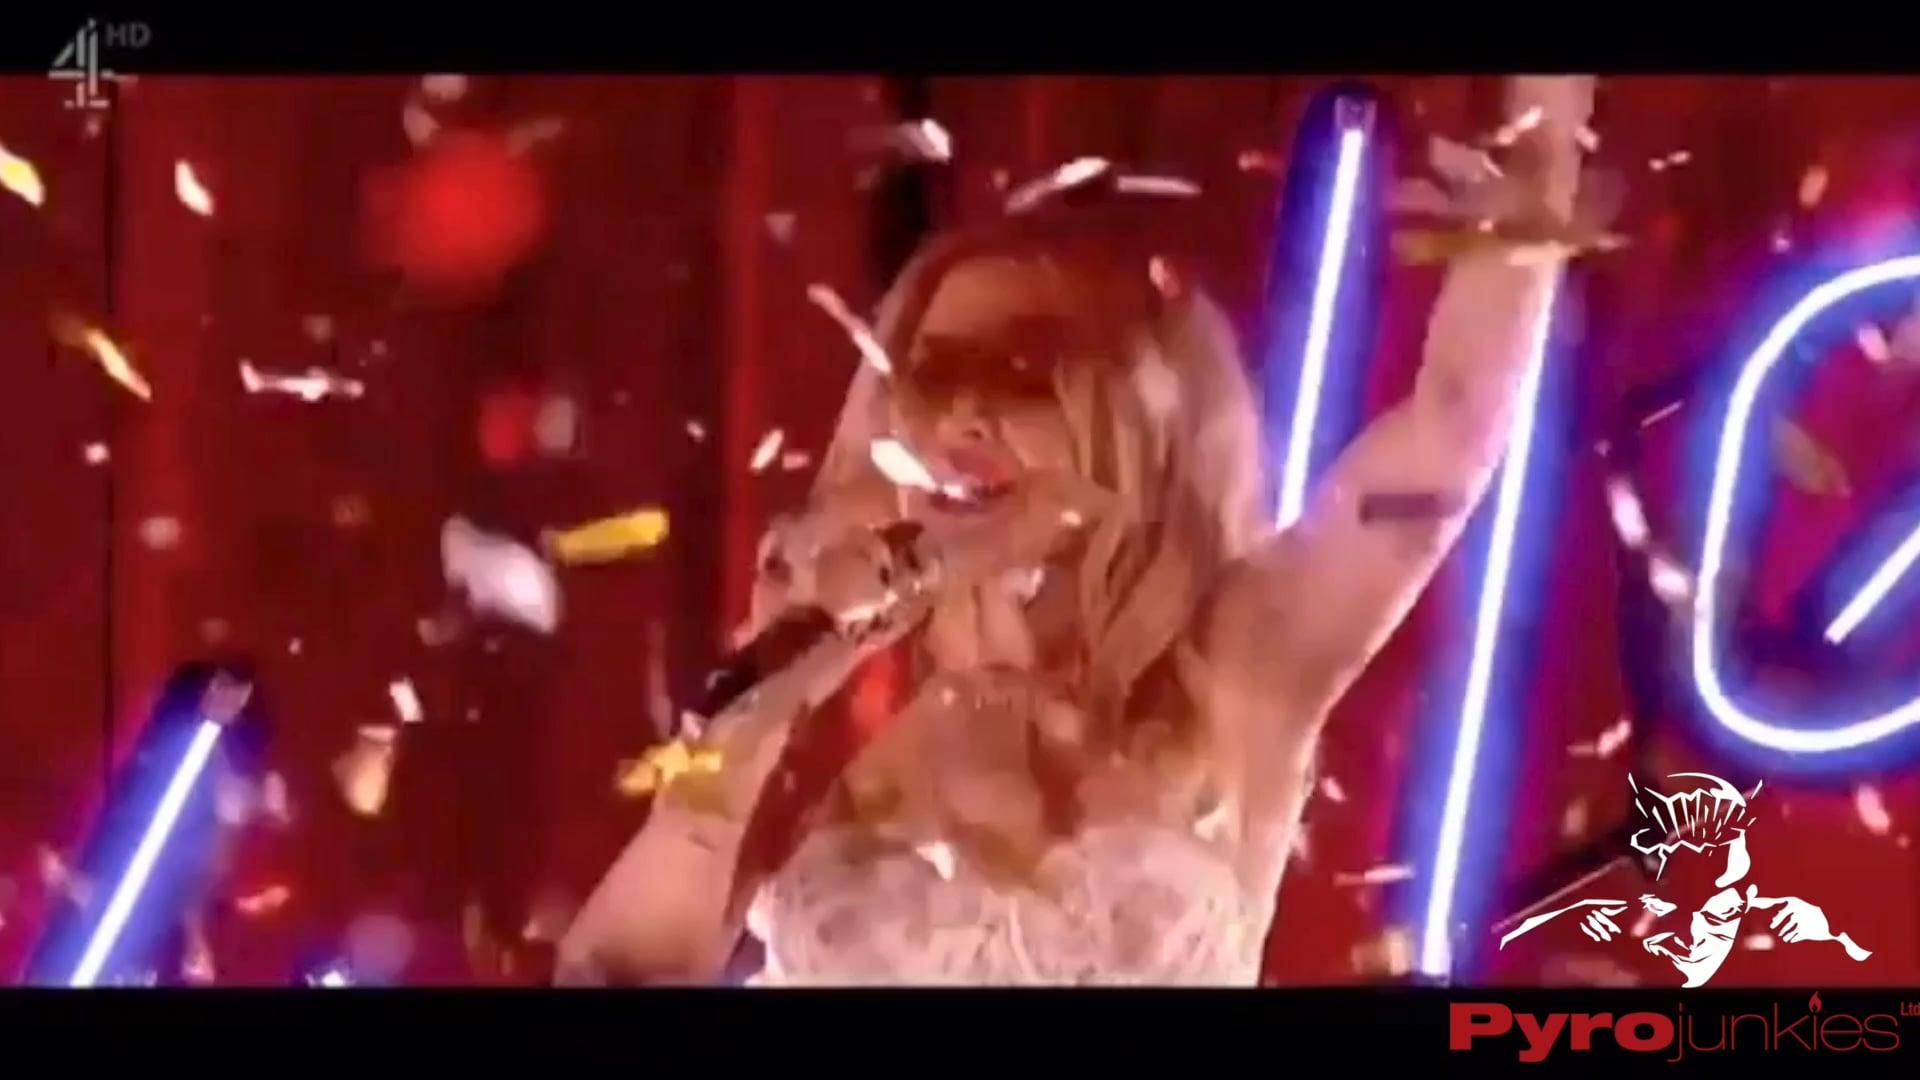 Kylie's Secret Night - Gold Confetti Blowers